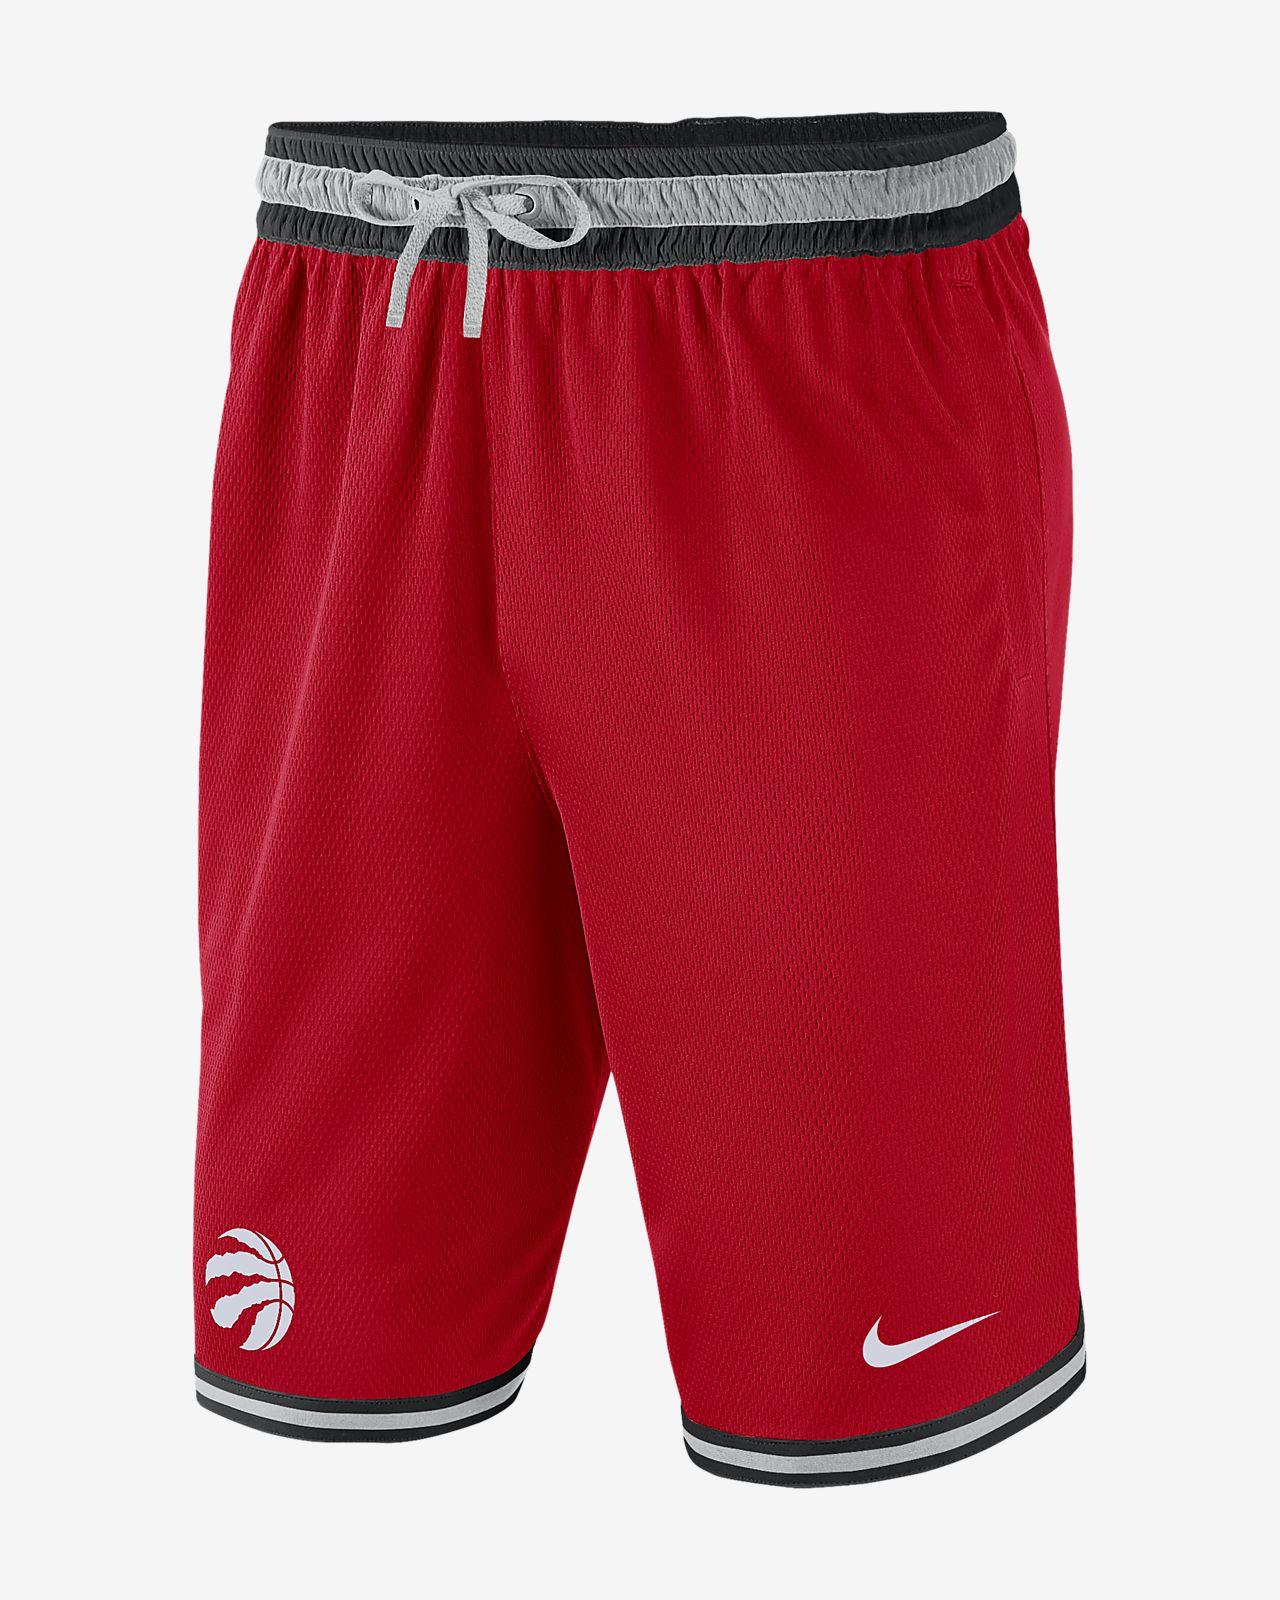 Toronto Raptors Nike NBA-Shorts für Herren